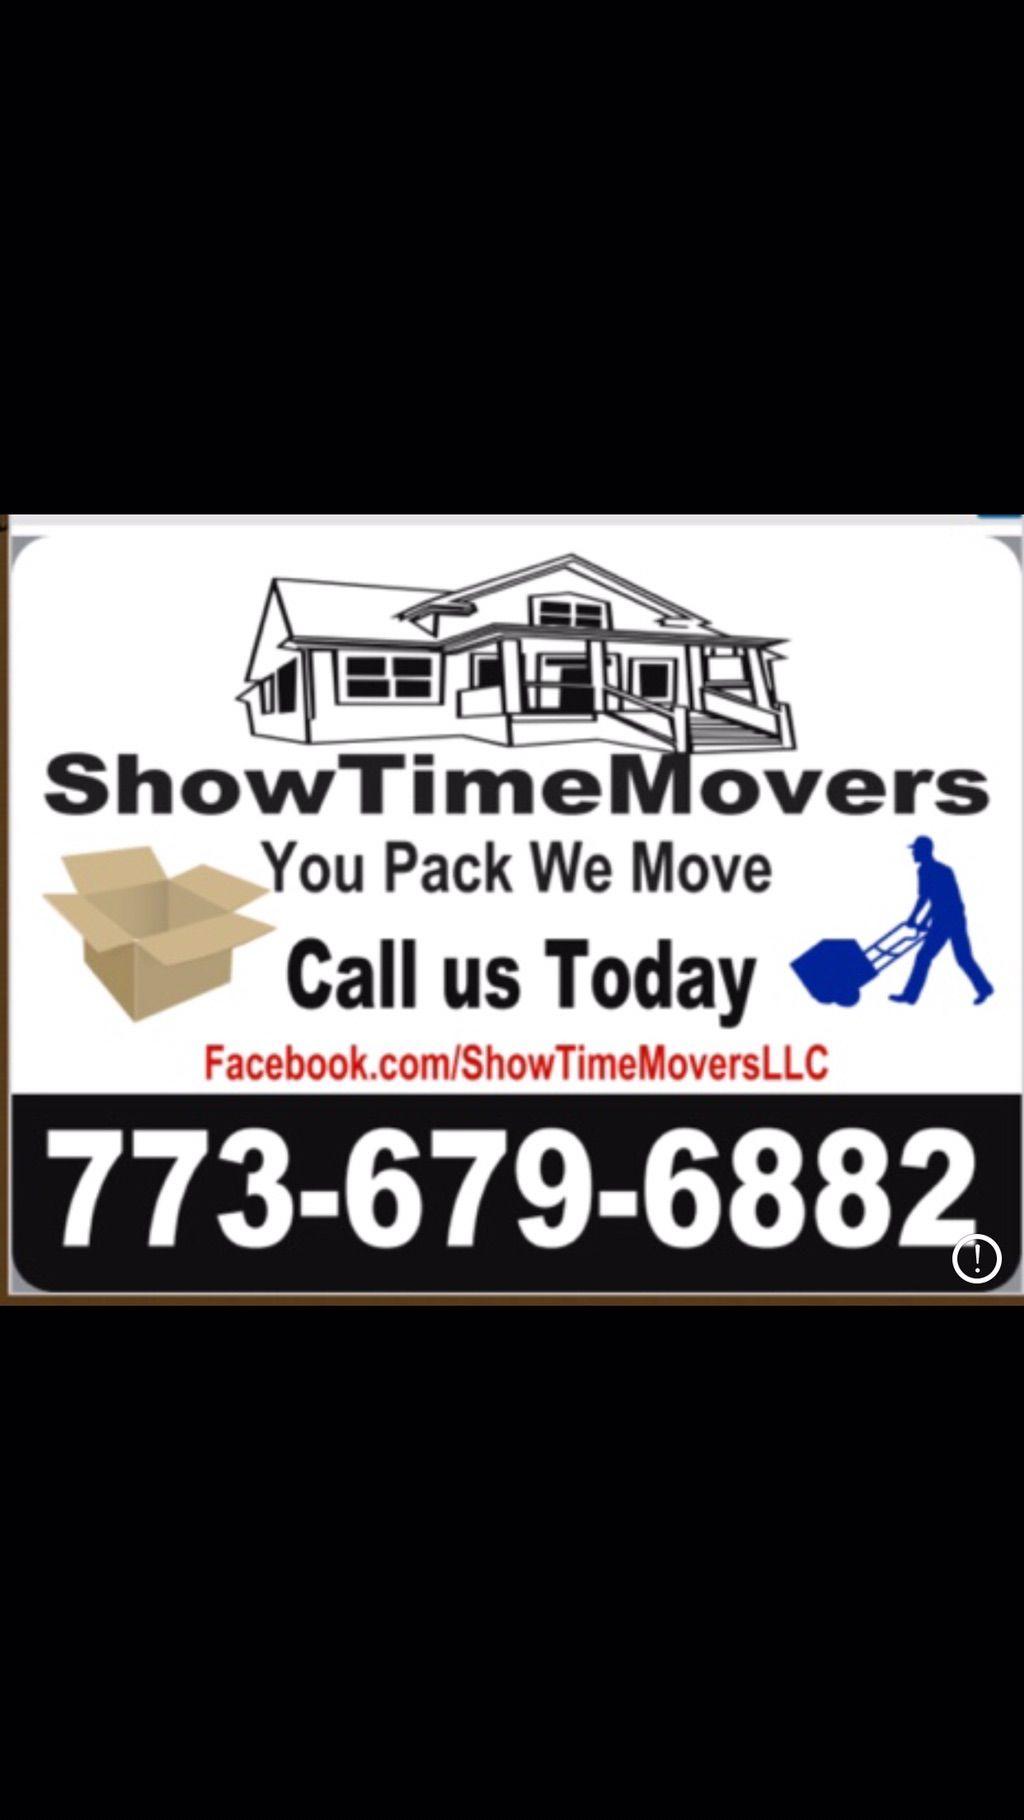 ShowTimeMovers LLC